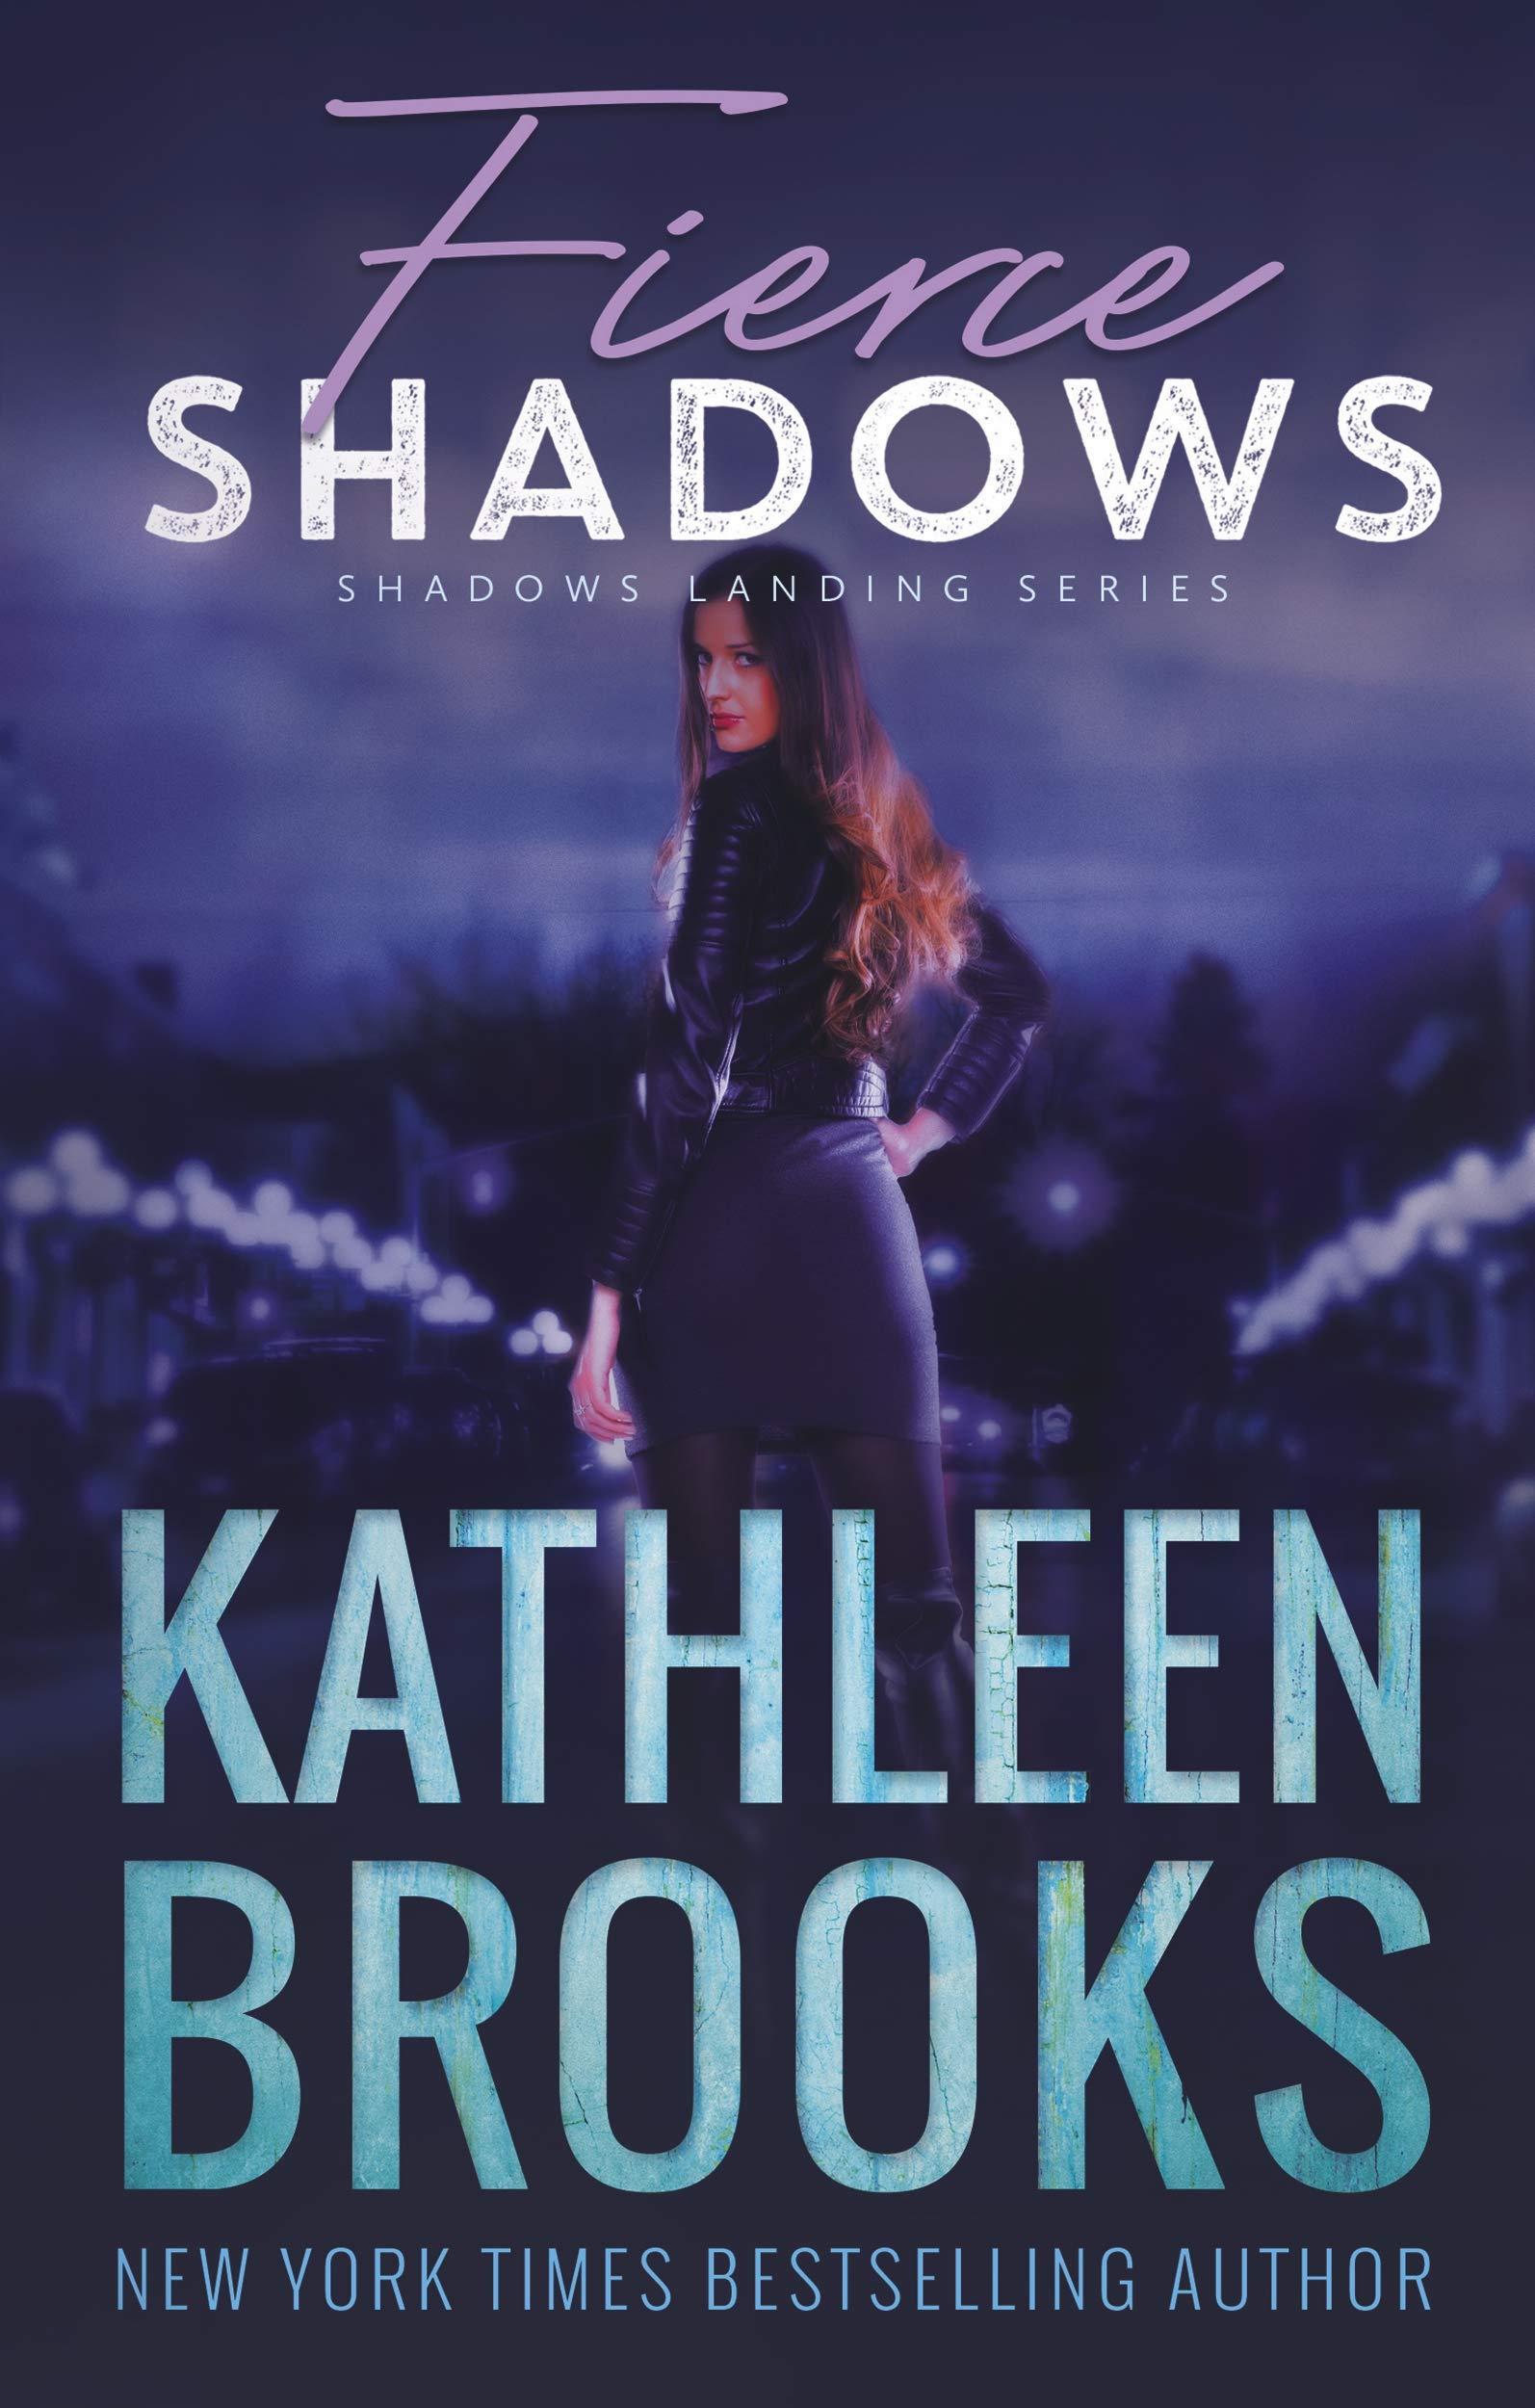 Fierce Shadows: Shadows Landing #4